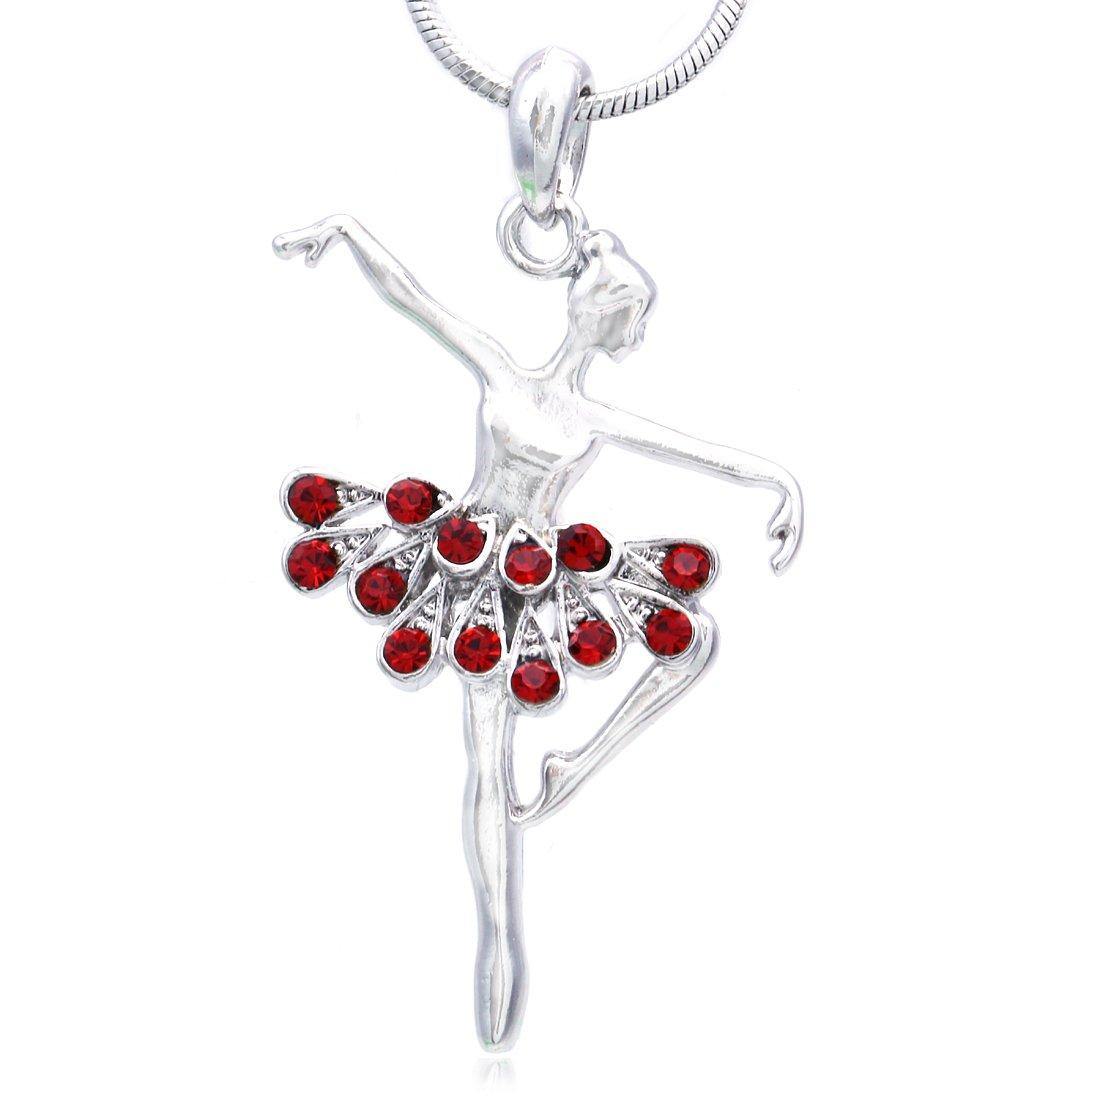 SoulBreezeCollection Dancing Ballerina Dancer Ballet Dance Pendant Necklace Charm n835aqua